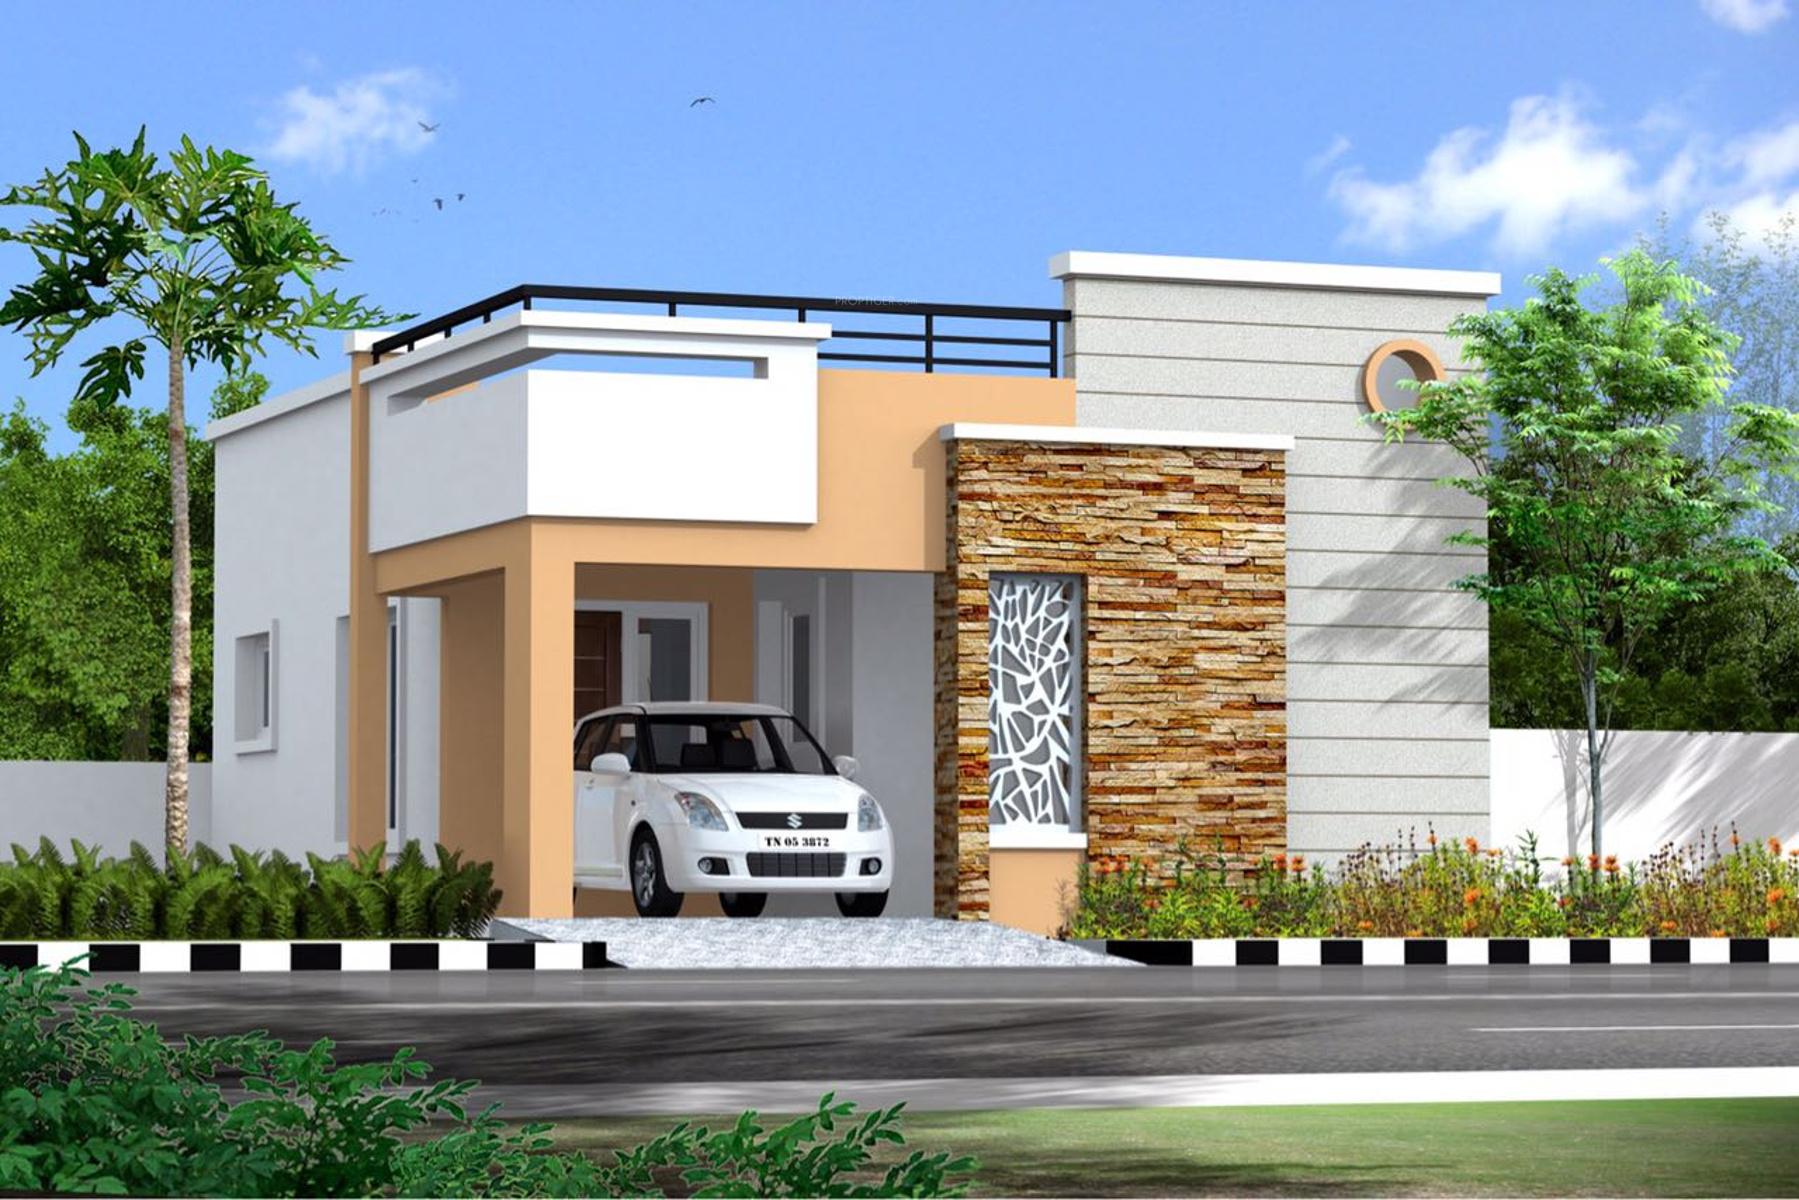 Ground Floor Elevation In Nadu : Value housing lakshmi nagar in east tambaram chennai